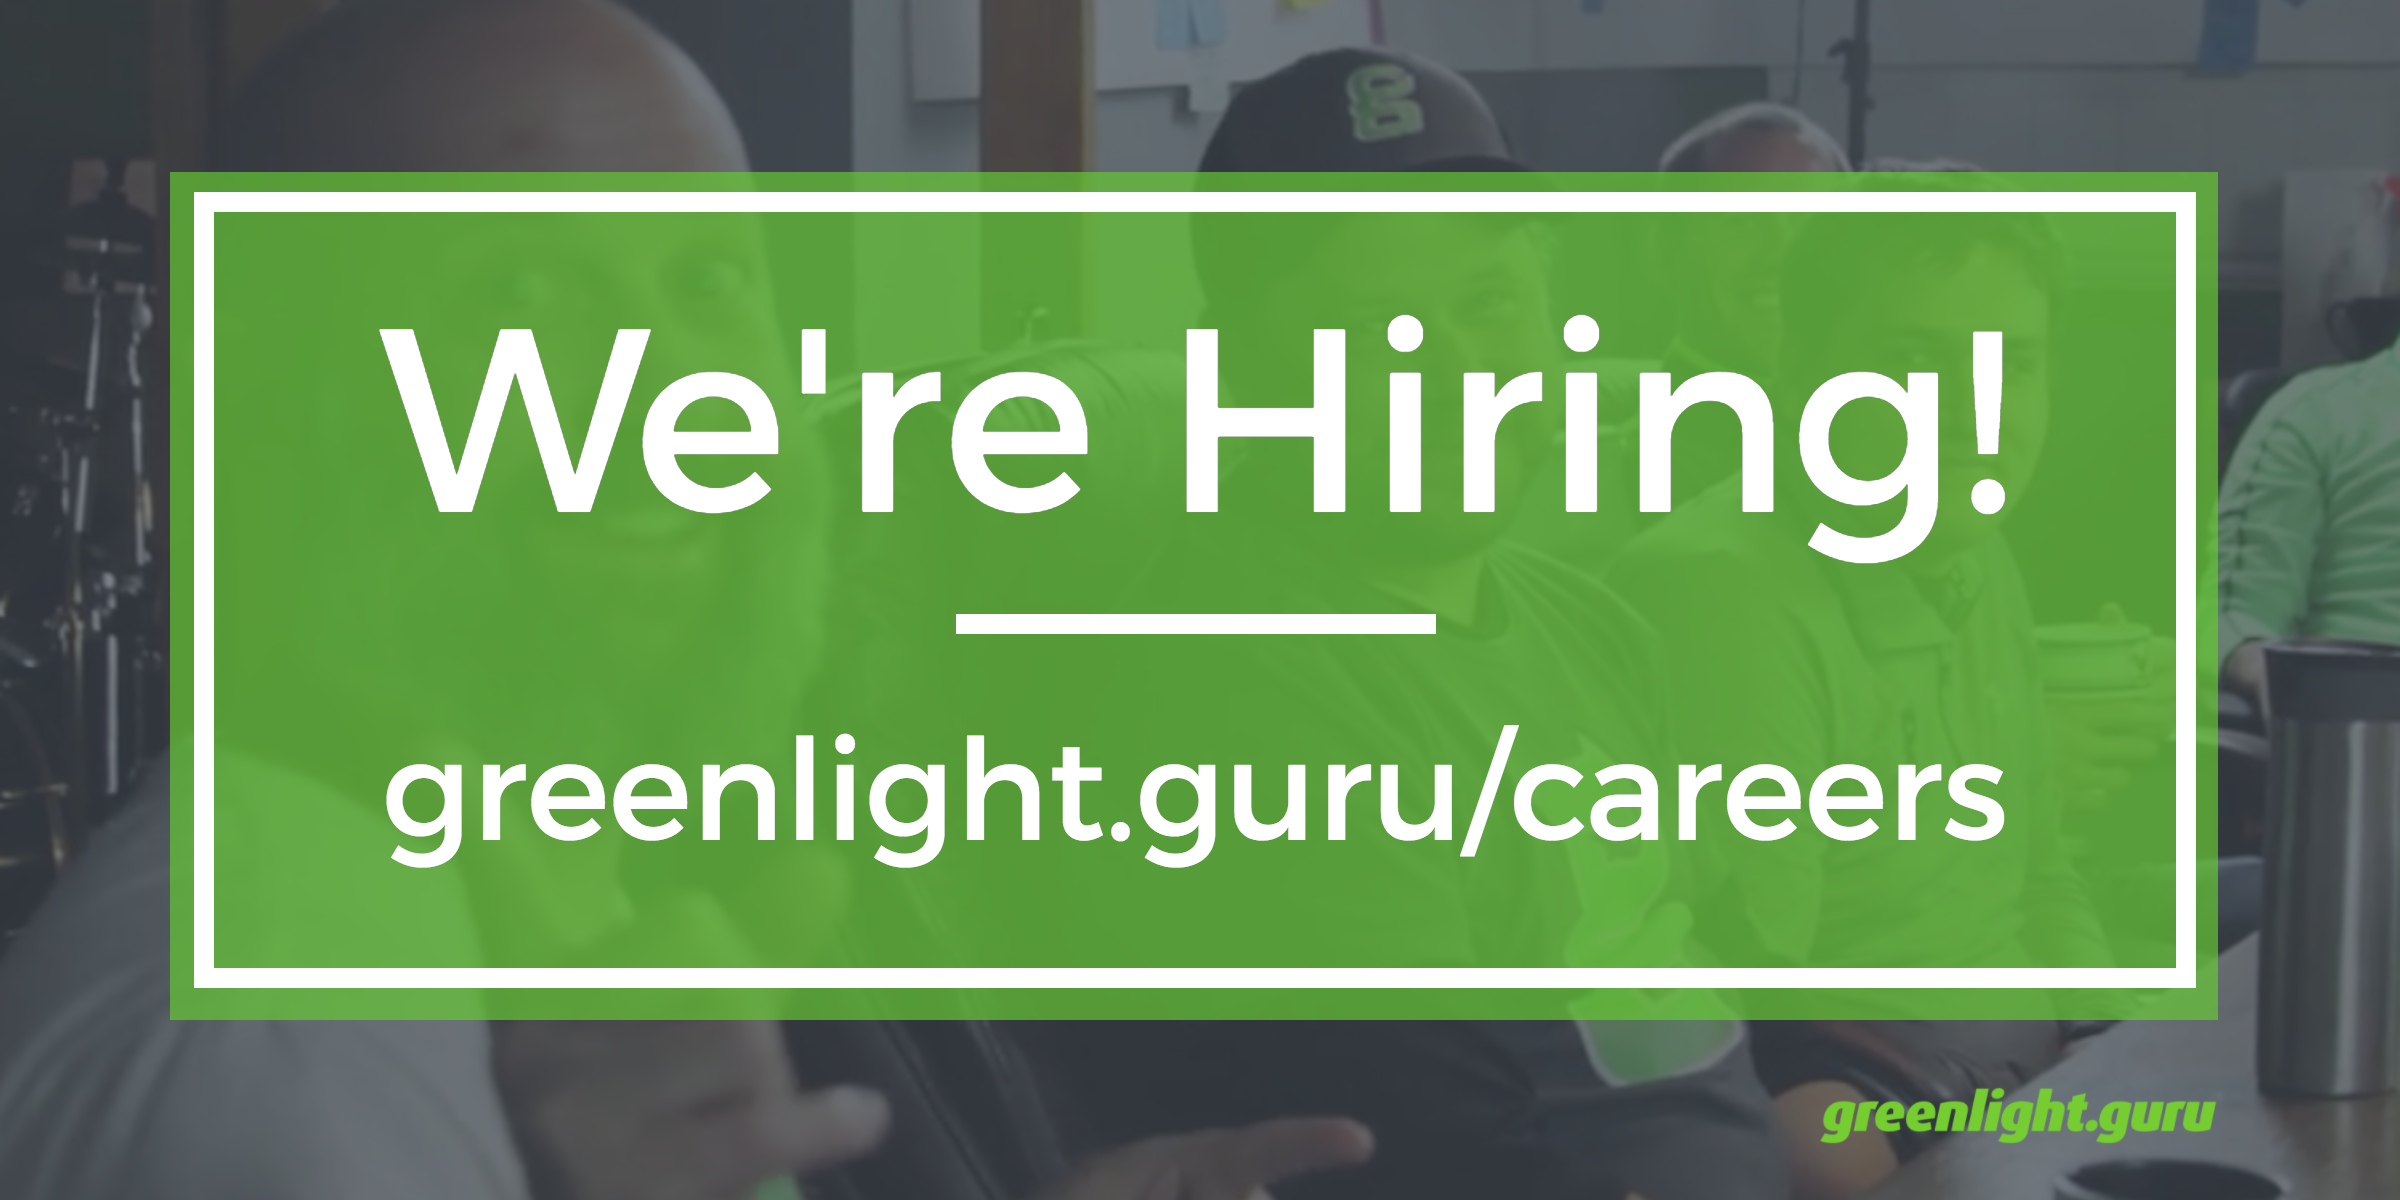 greenlight_guru_hiring.png